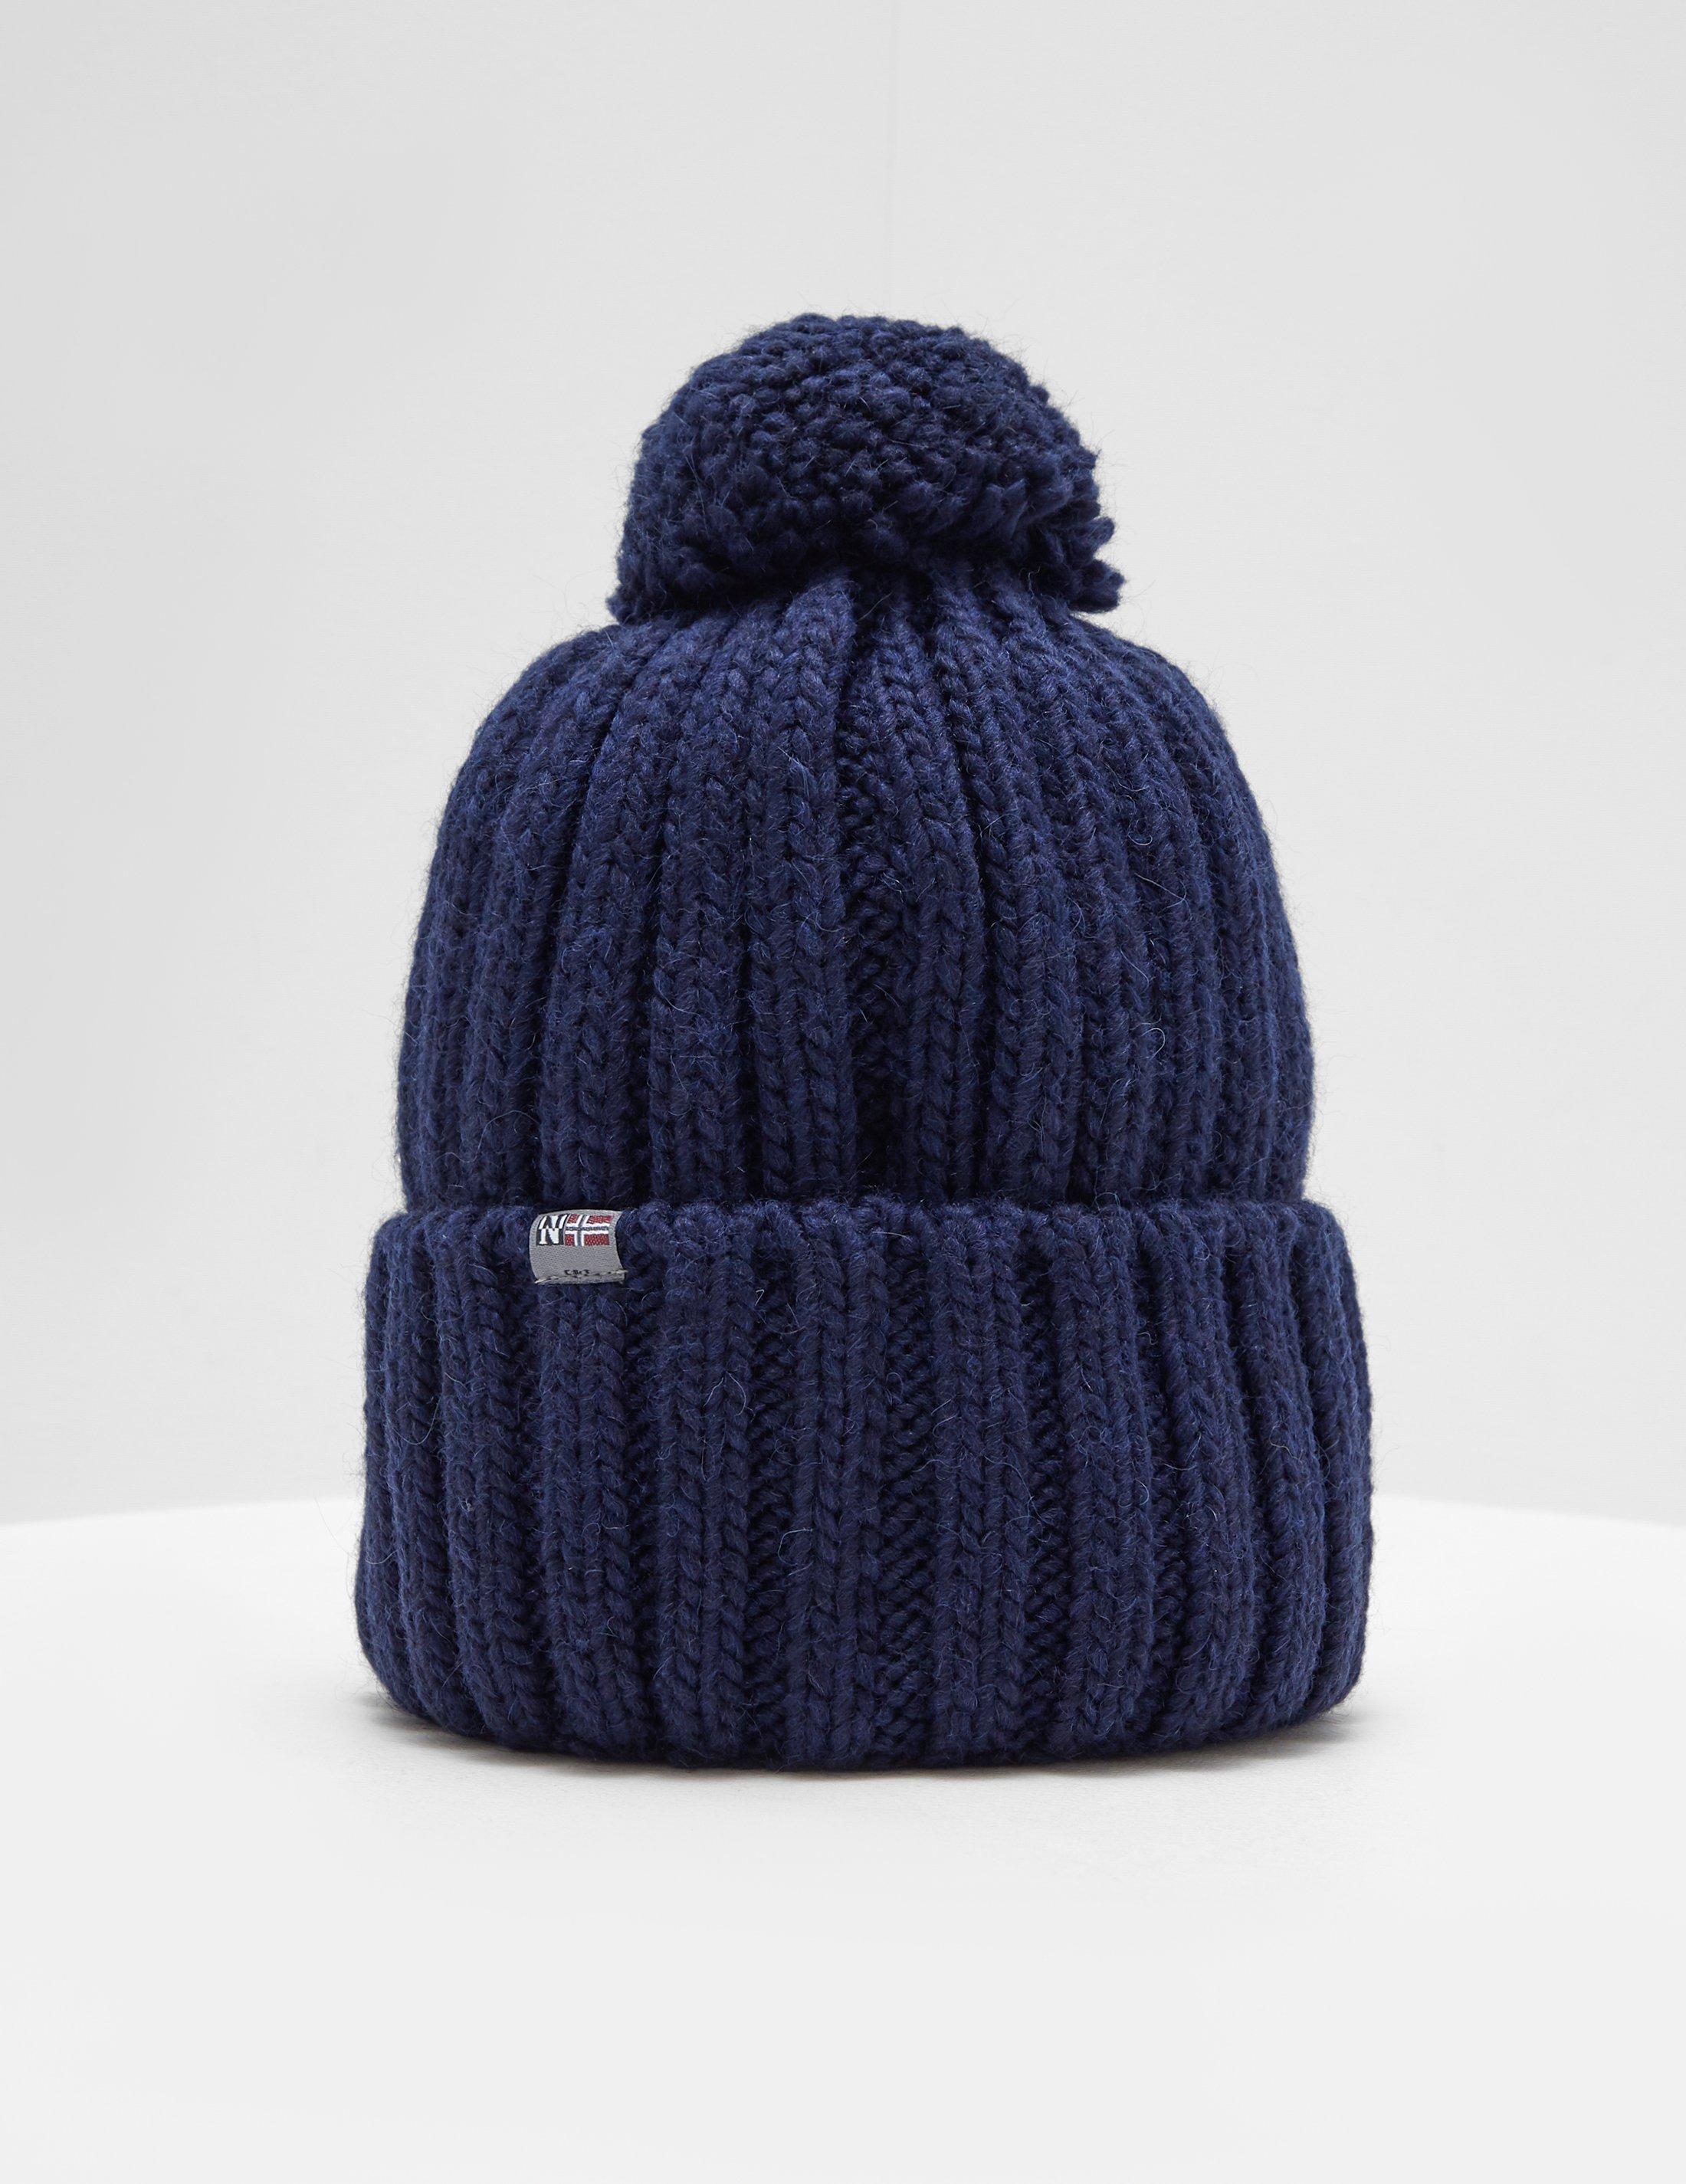 db1c79f62cd Lyst - Napapijri Semiury Bobble Hat Navy Blue in Blue for Men